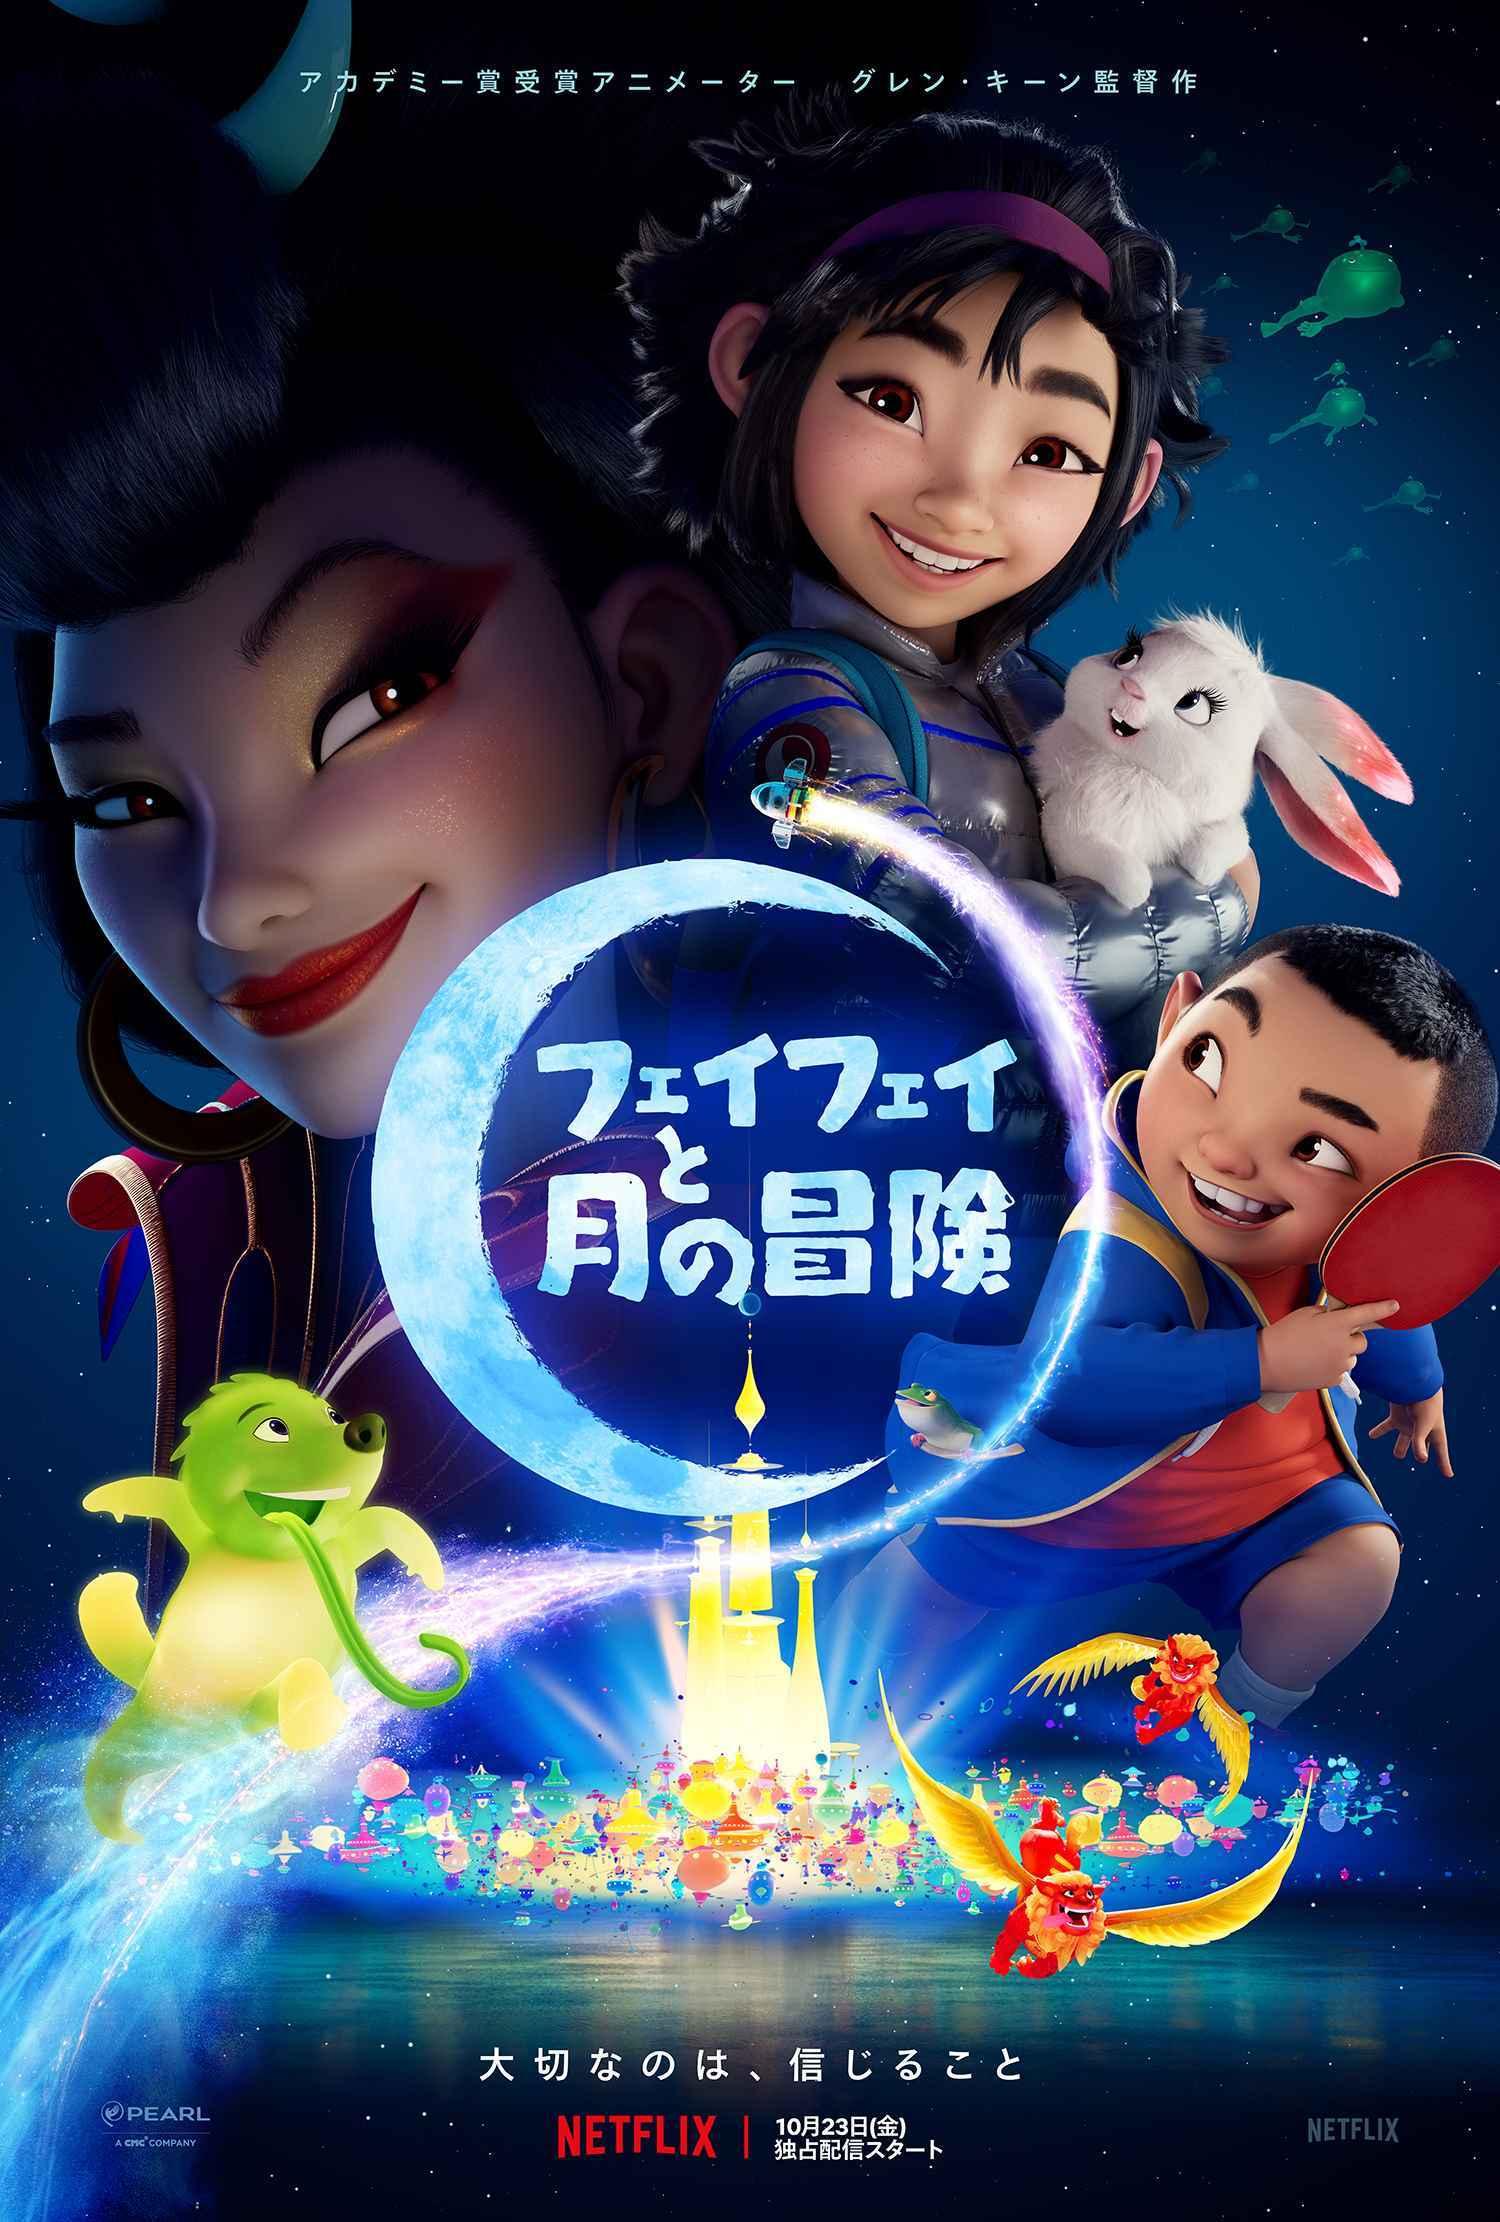 Netflix映画『フェイフェイと月の冒険』10月23日(金)より独占配信開始